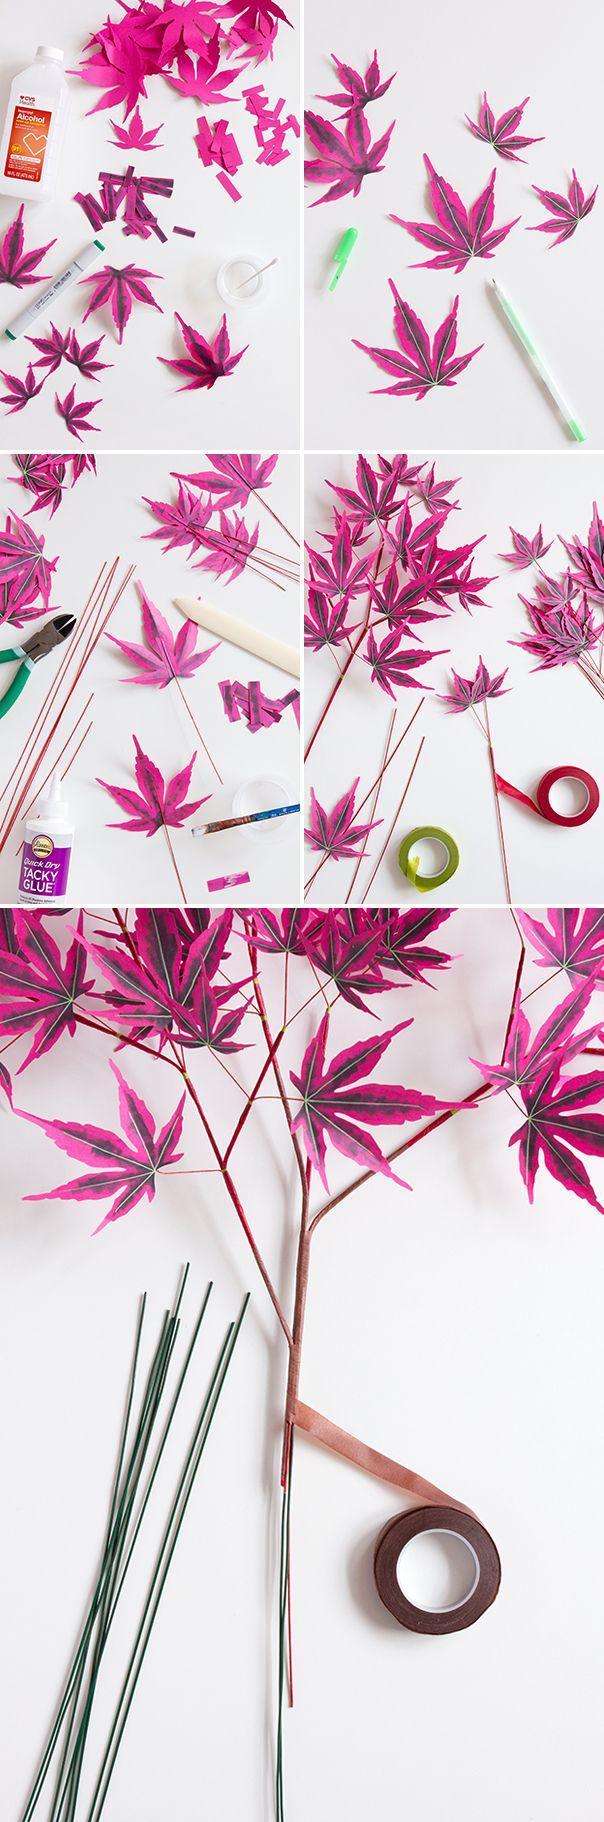 DIY Japanese Maple tree #japanesemaple